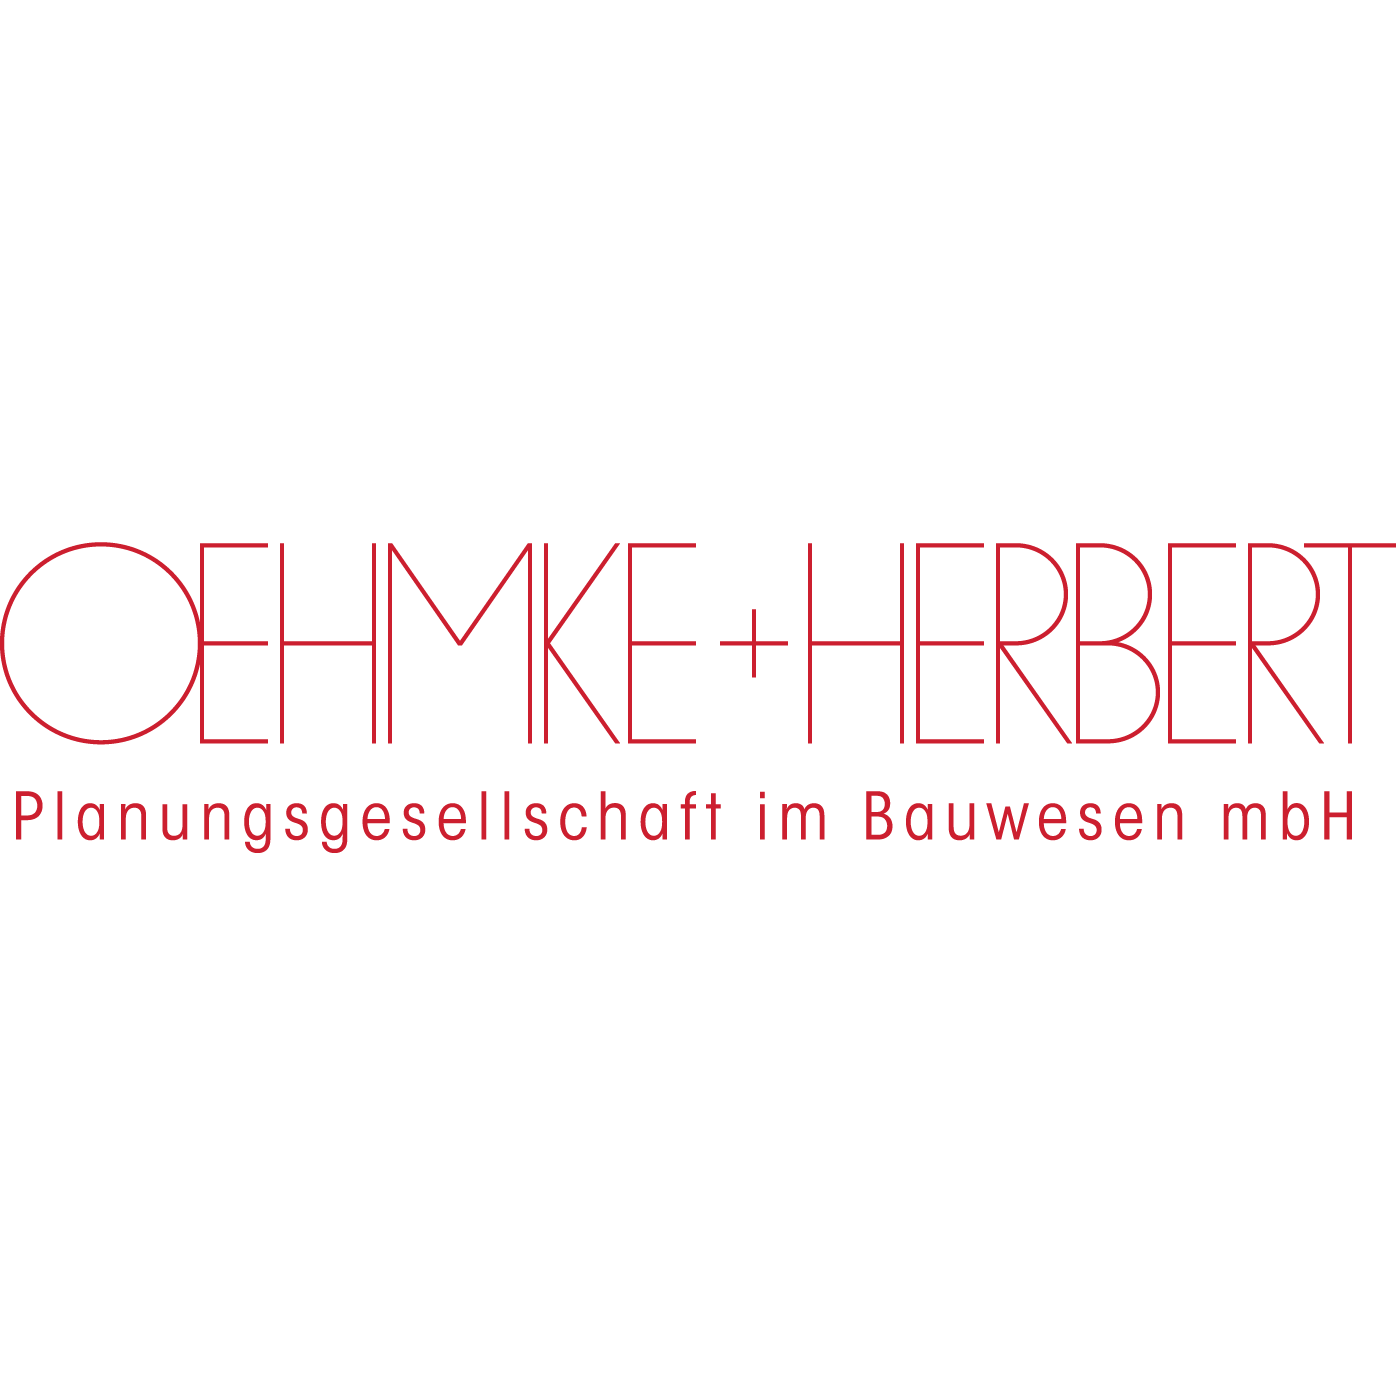 Bild zu OEHMKE + HERBERT Planungsgesellschaft im Bauwesen mbH in Nürnberg